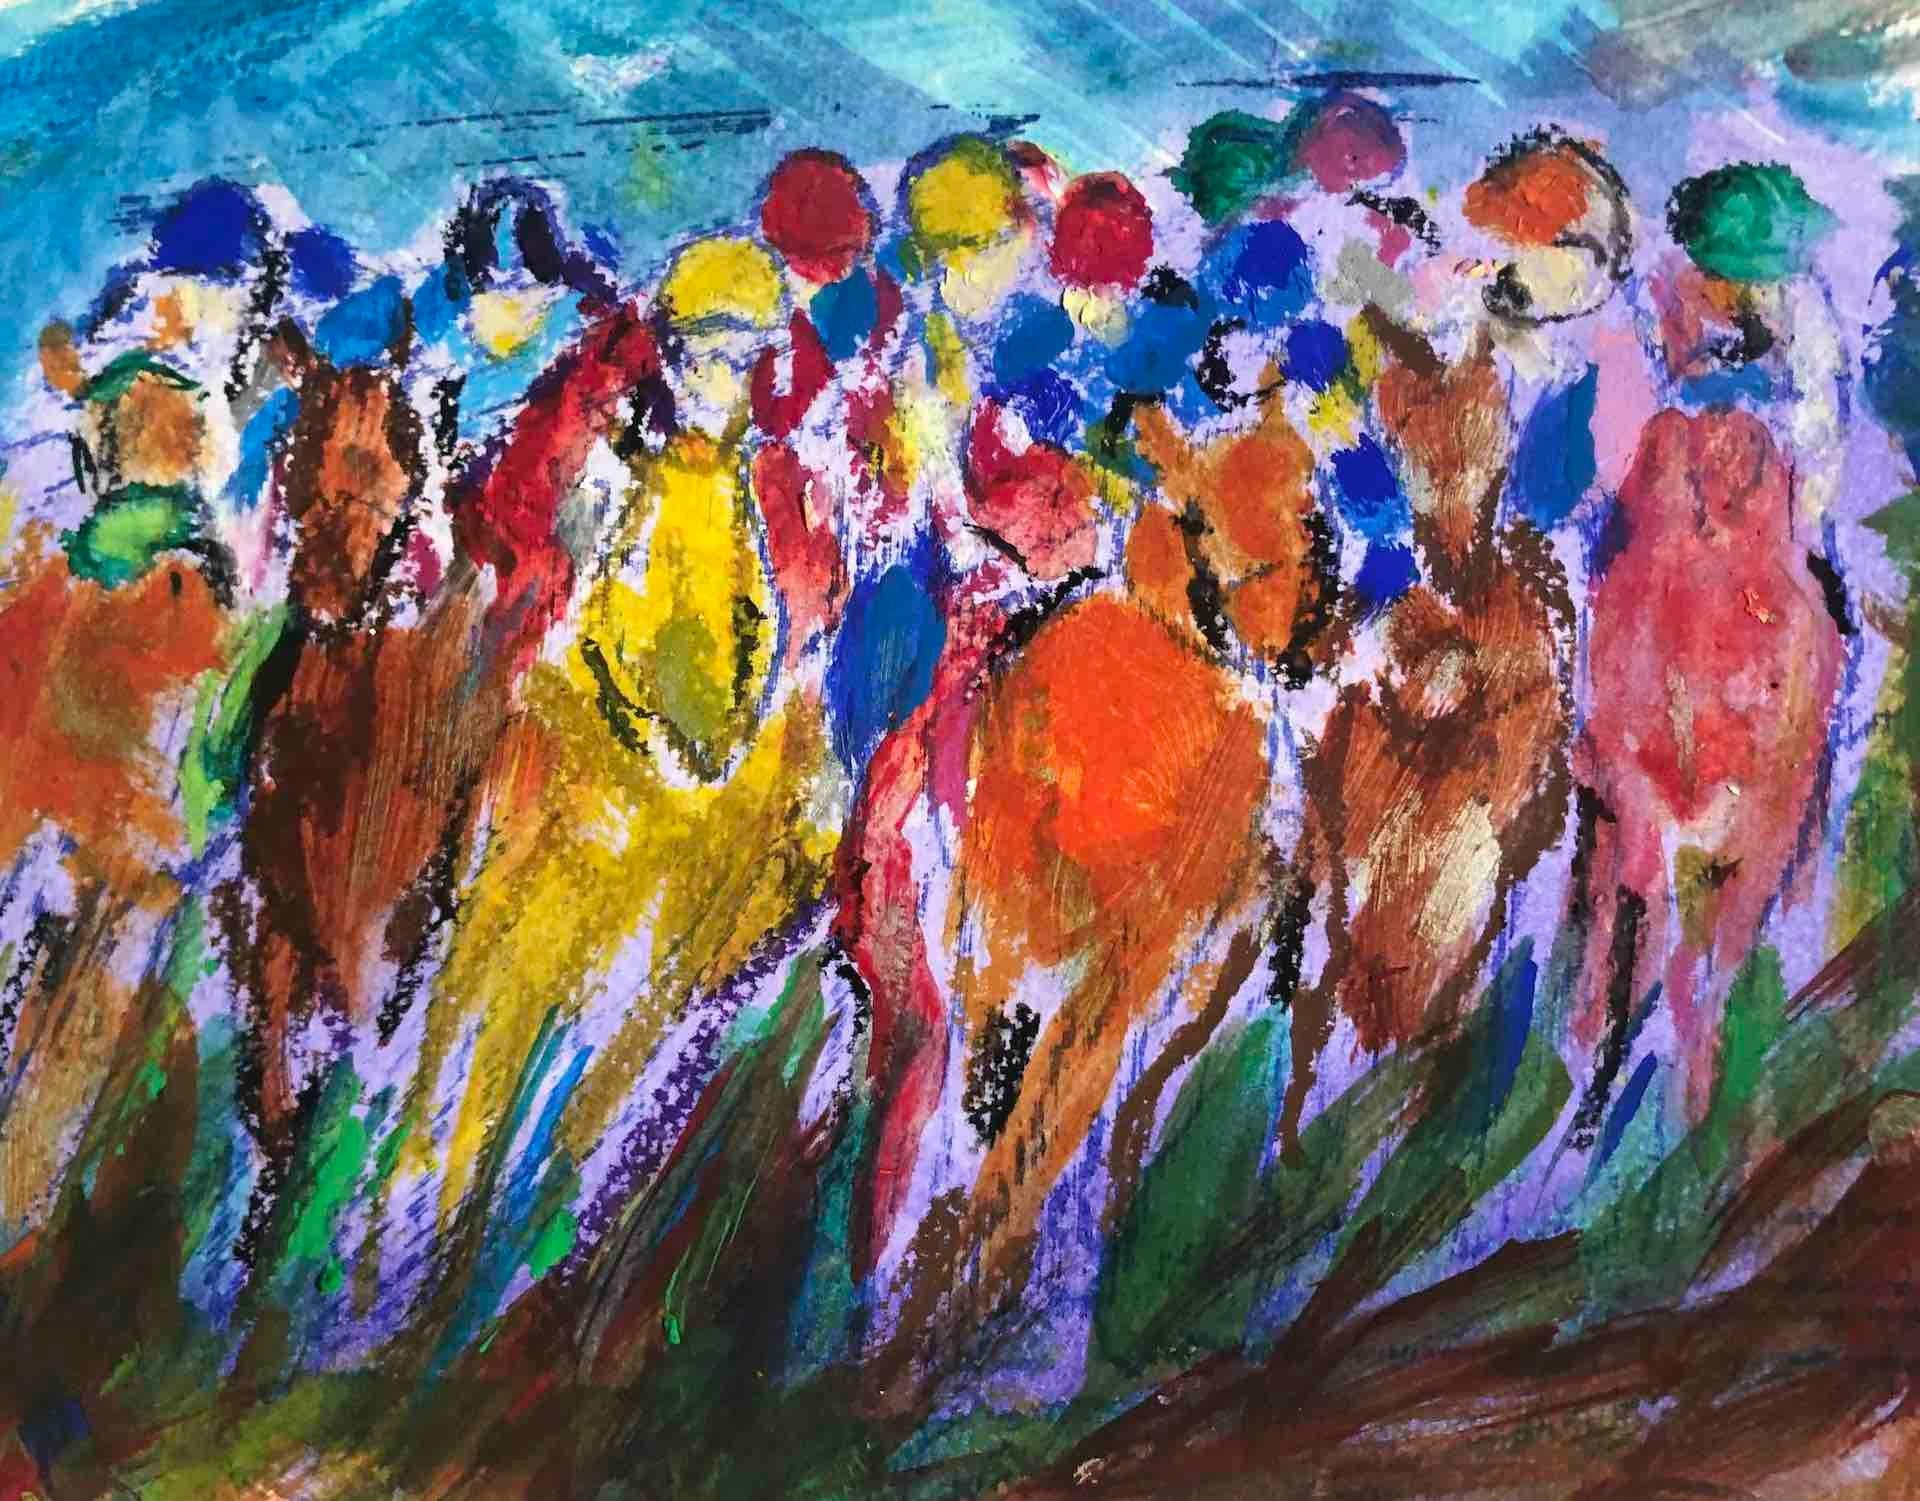 Garth Bayley, Polka Dot, Original Horse Racing Painting, Bright Equine Sport Art